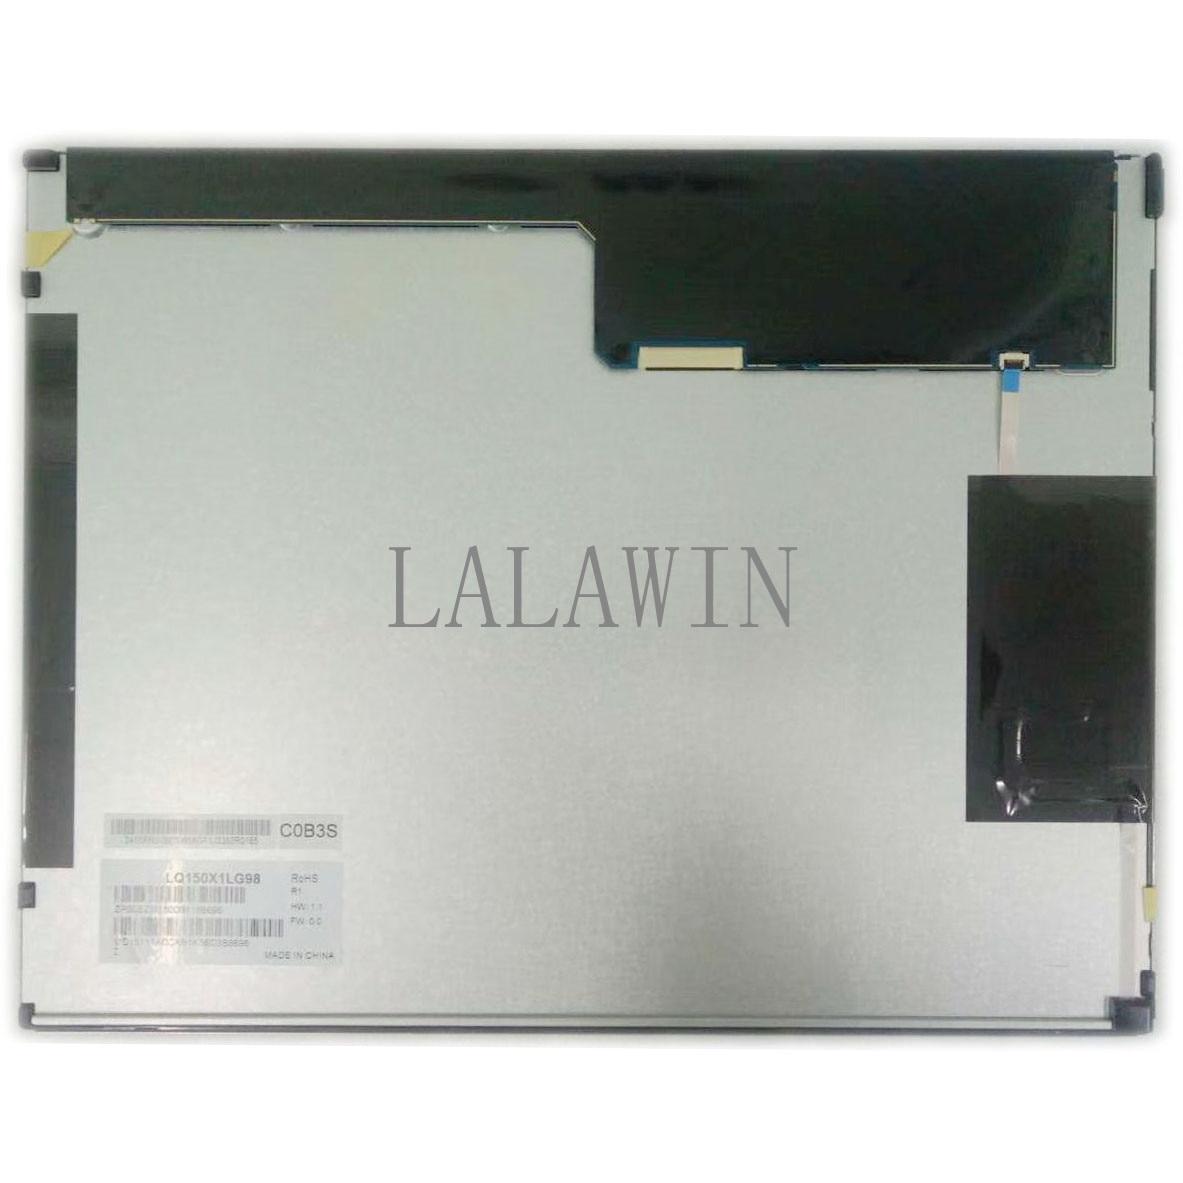 LQ150X1LG98 R1 LED 1024*768 TFT إصلاح شاشة LCD لوحة